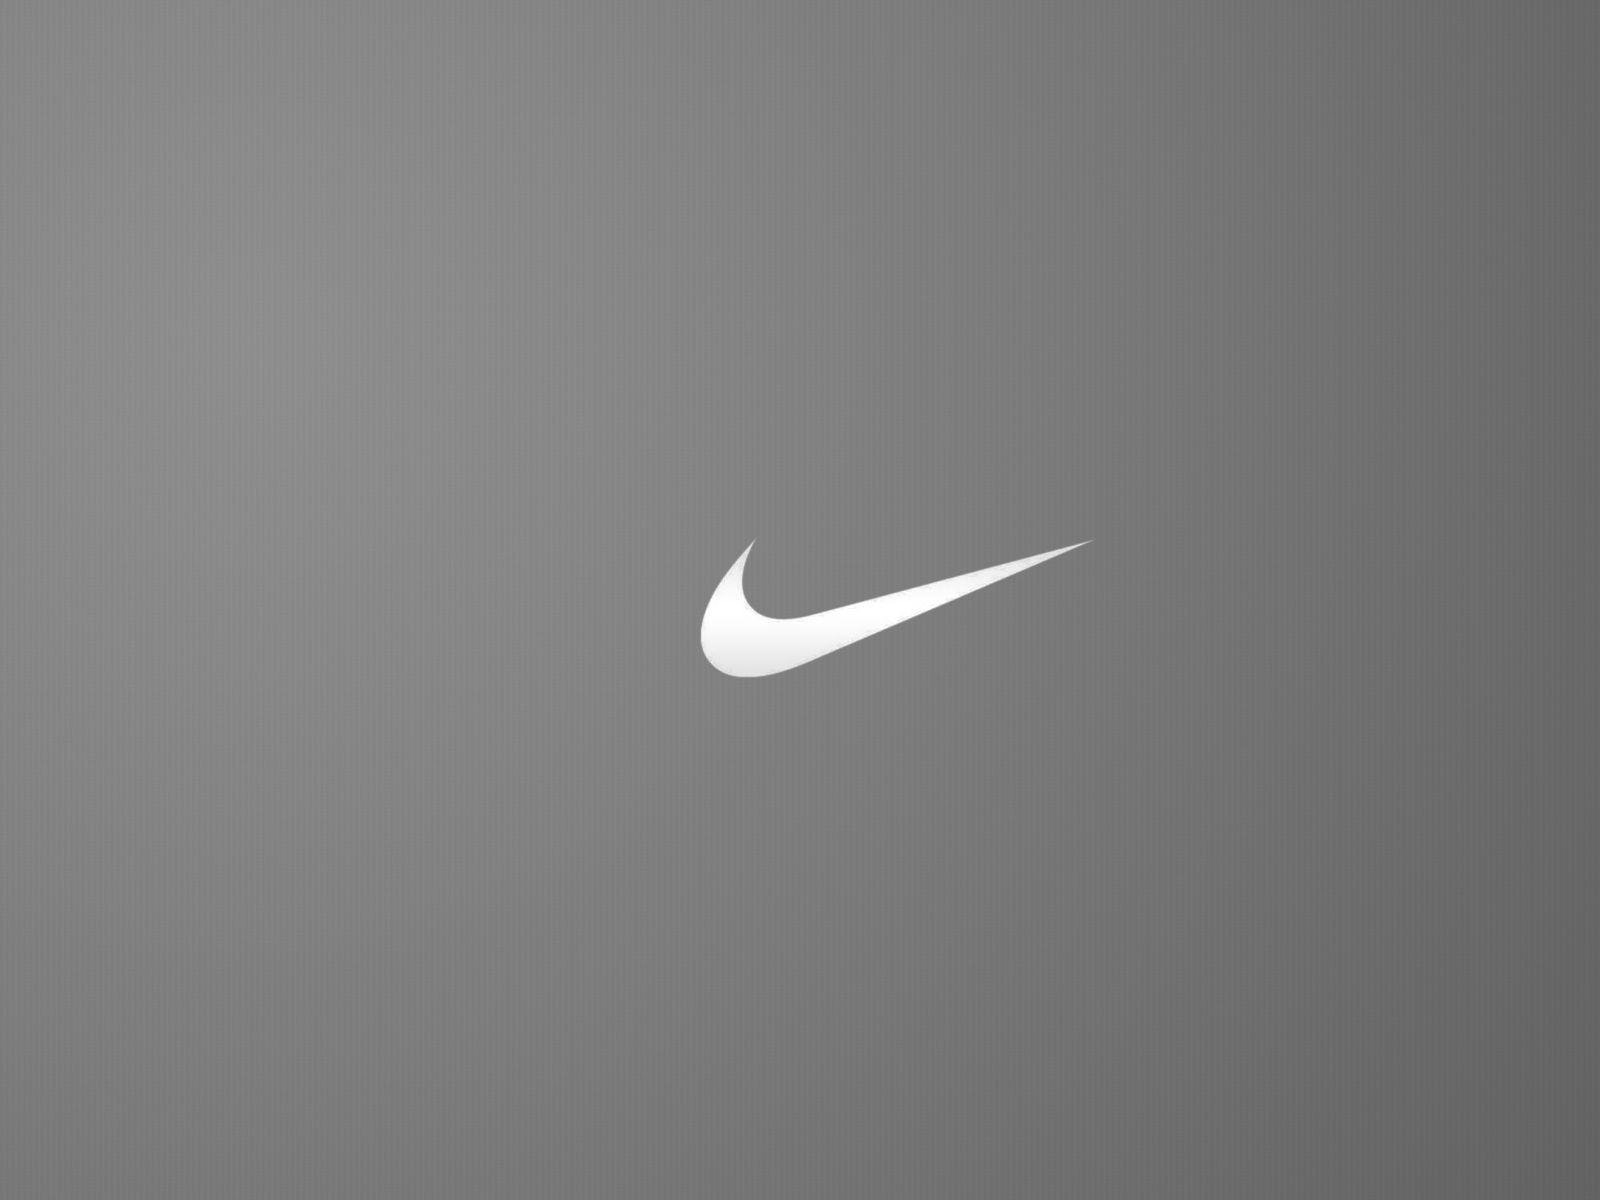 Nike Black Wallpapers